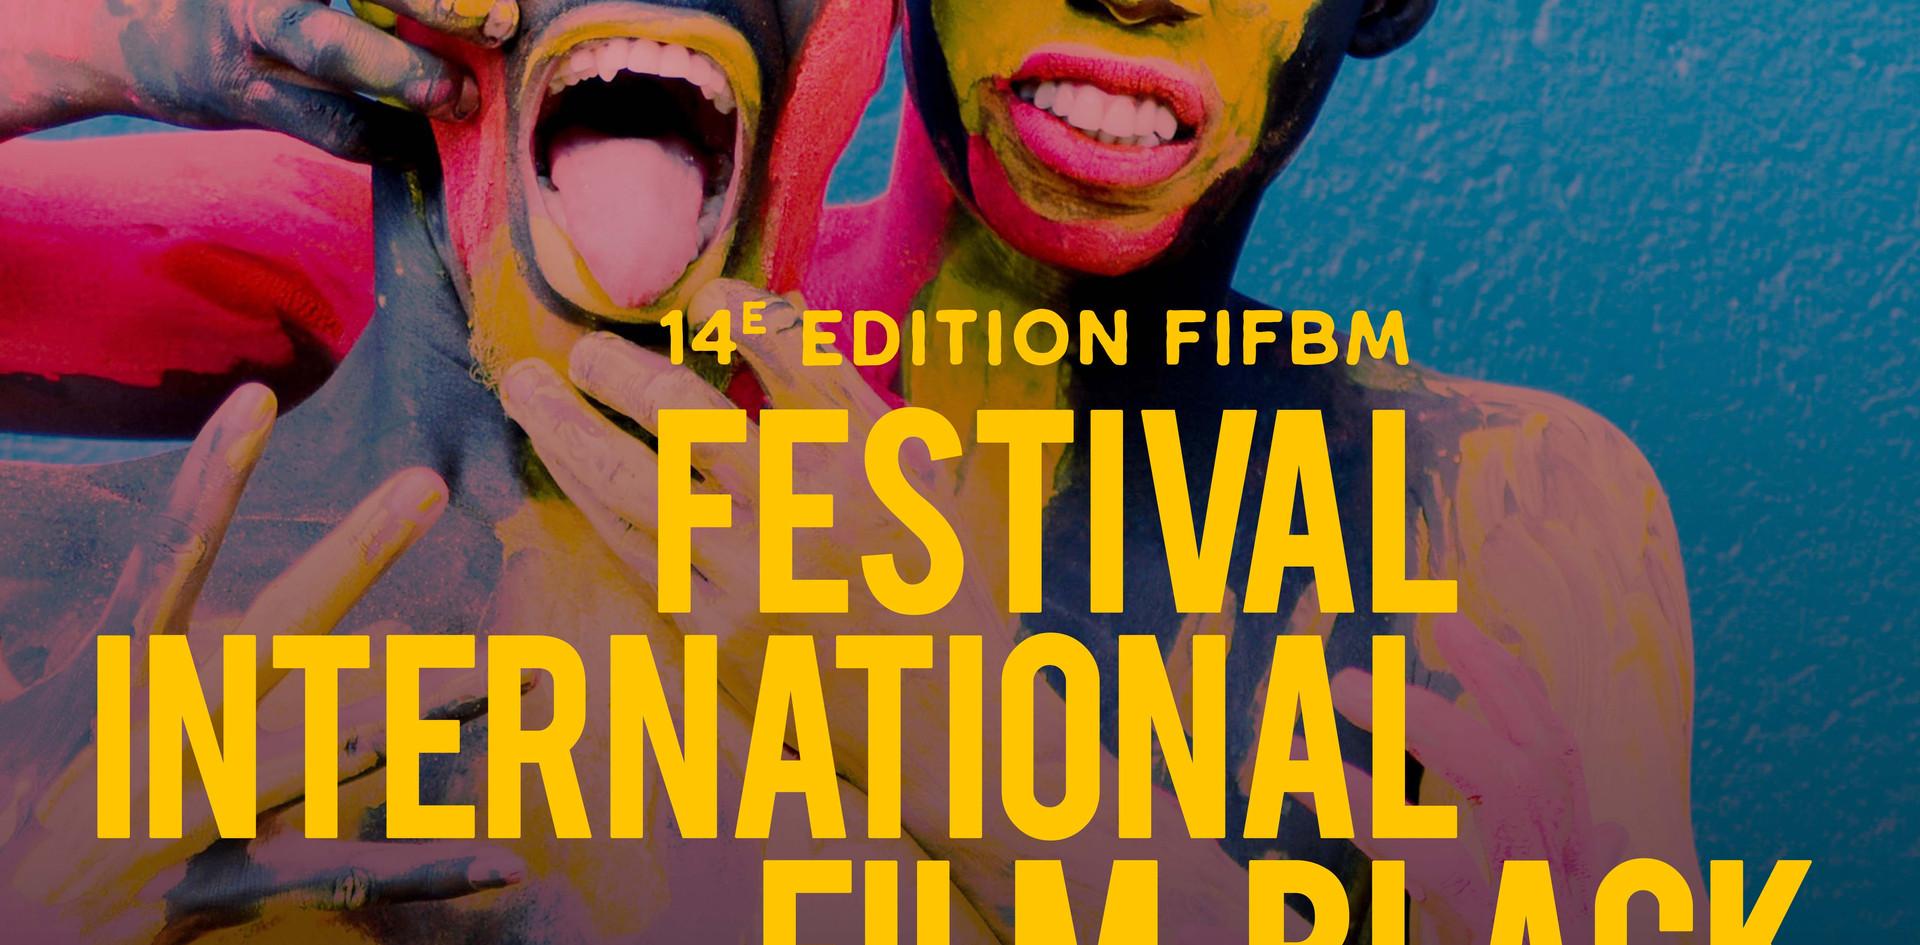 FIFBM_BG_01.jpg